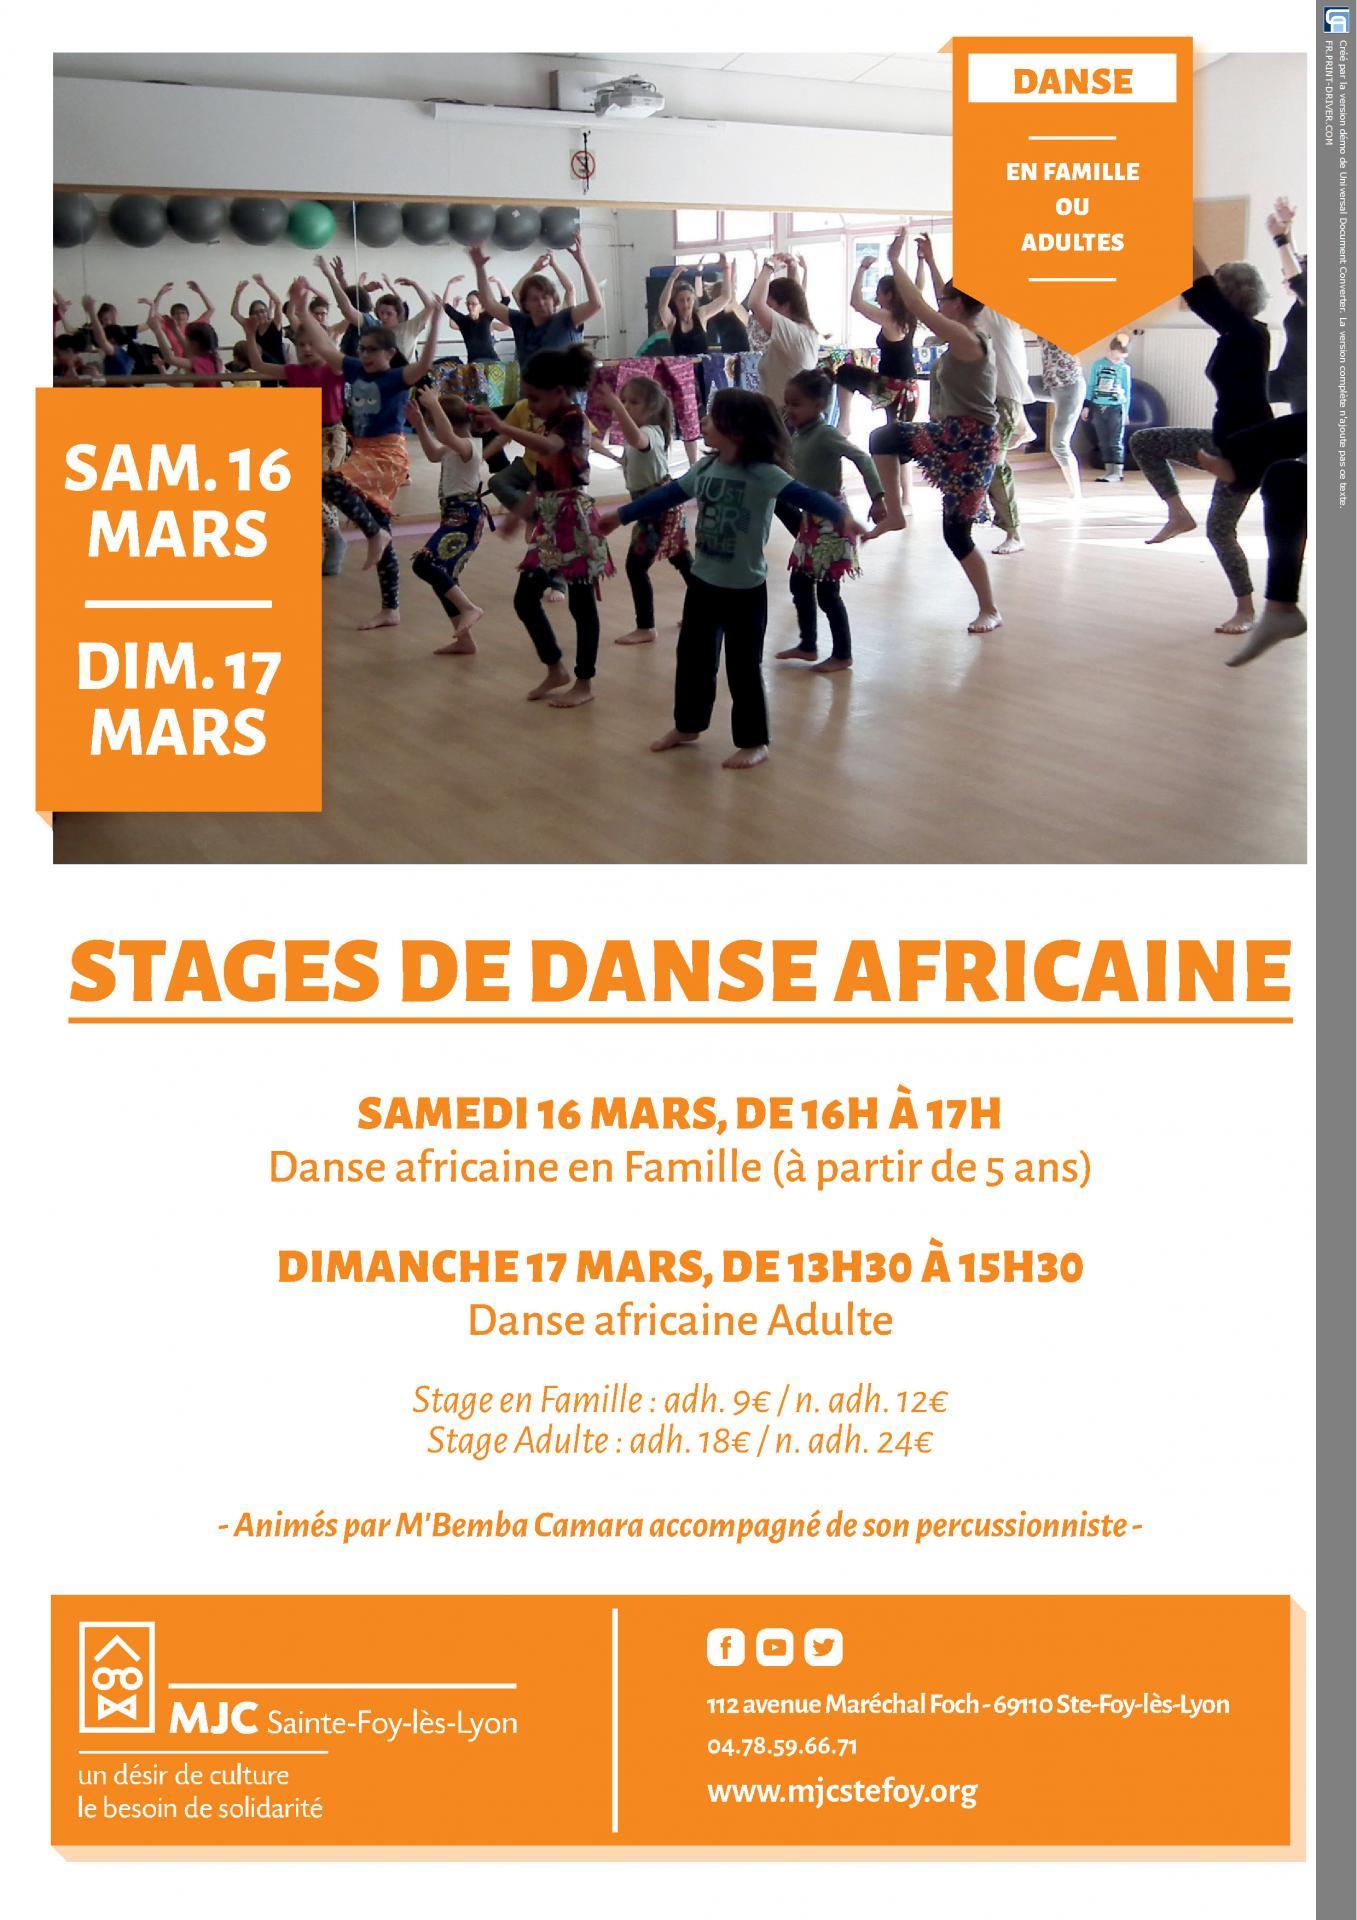 2019-16 17 mars stage de danse africaine